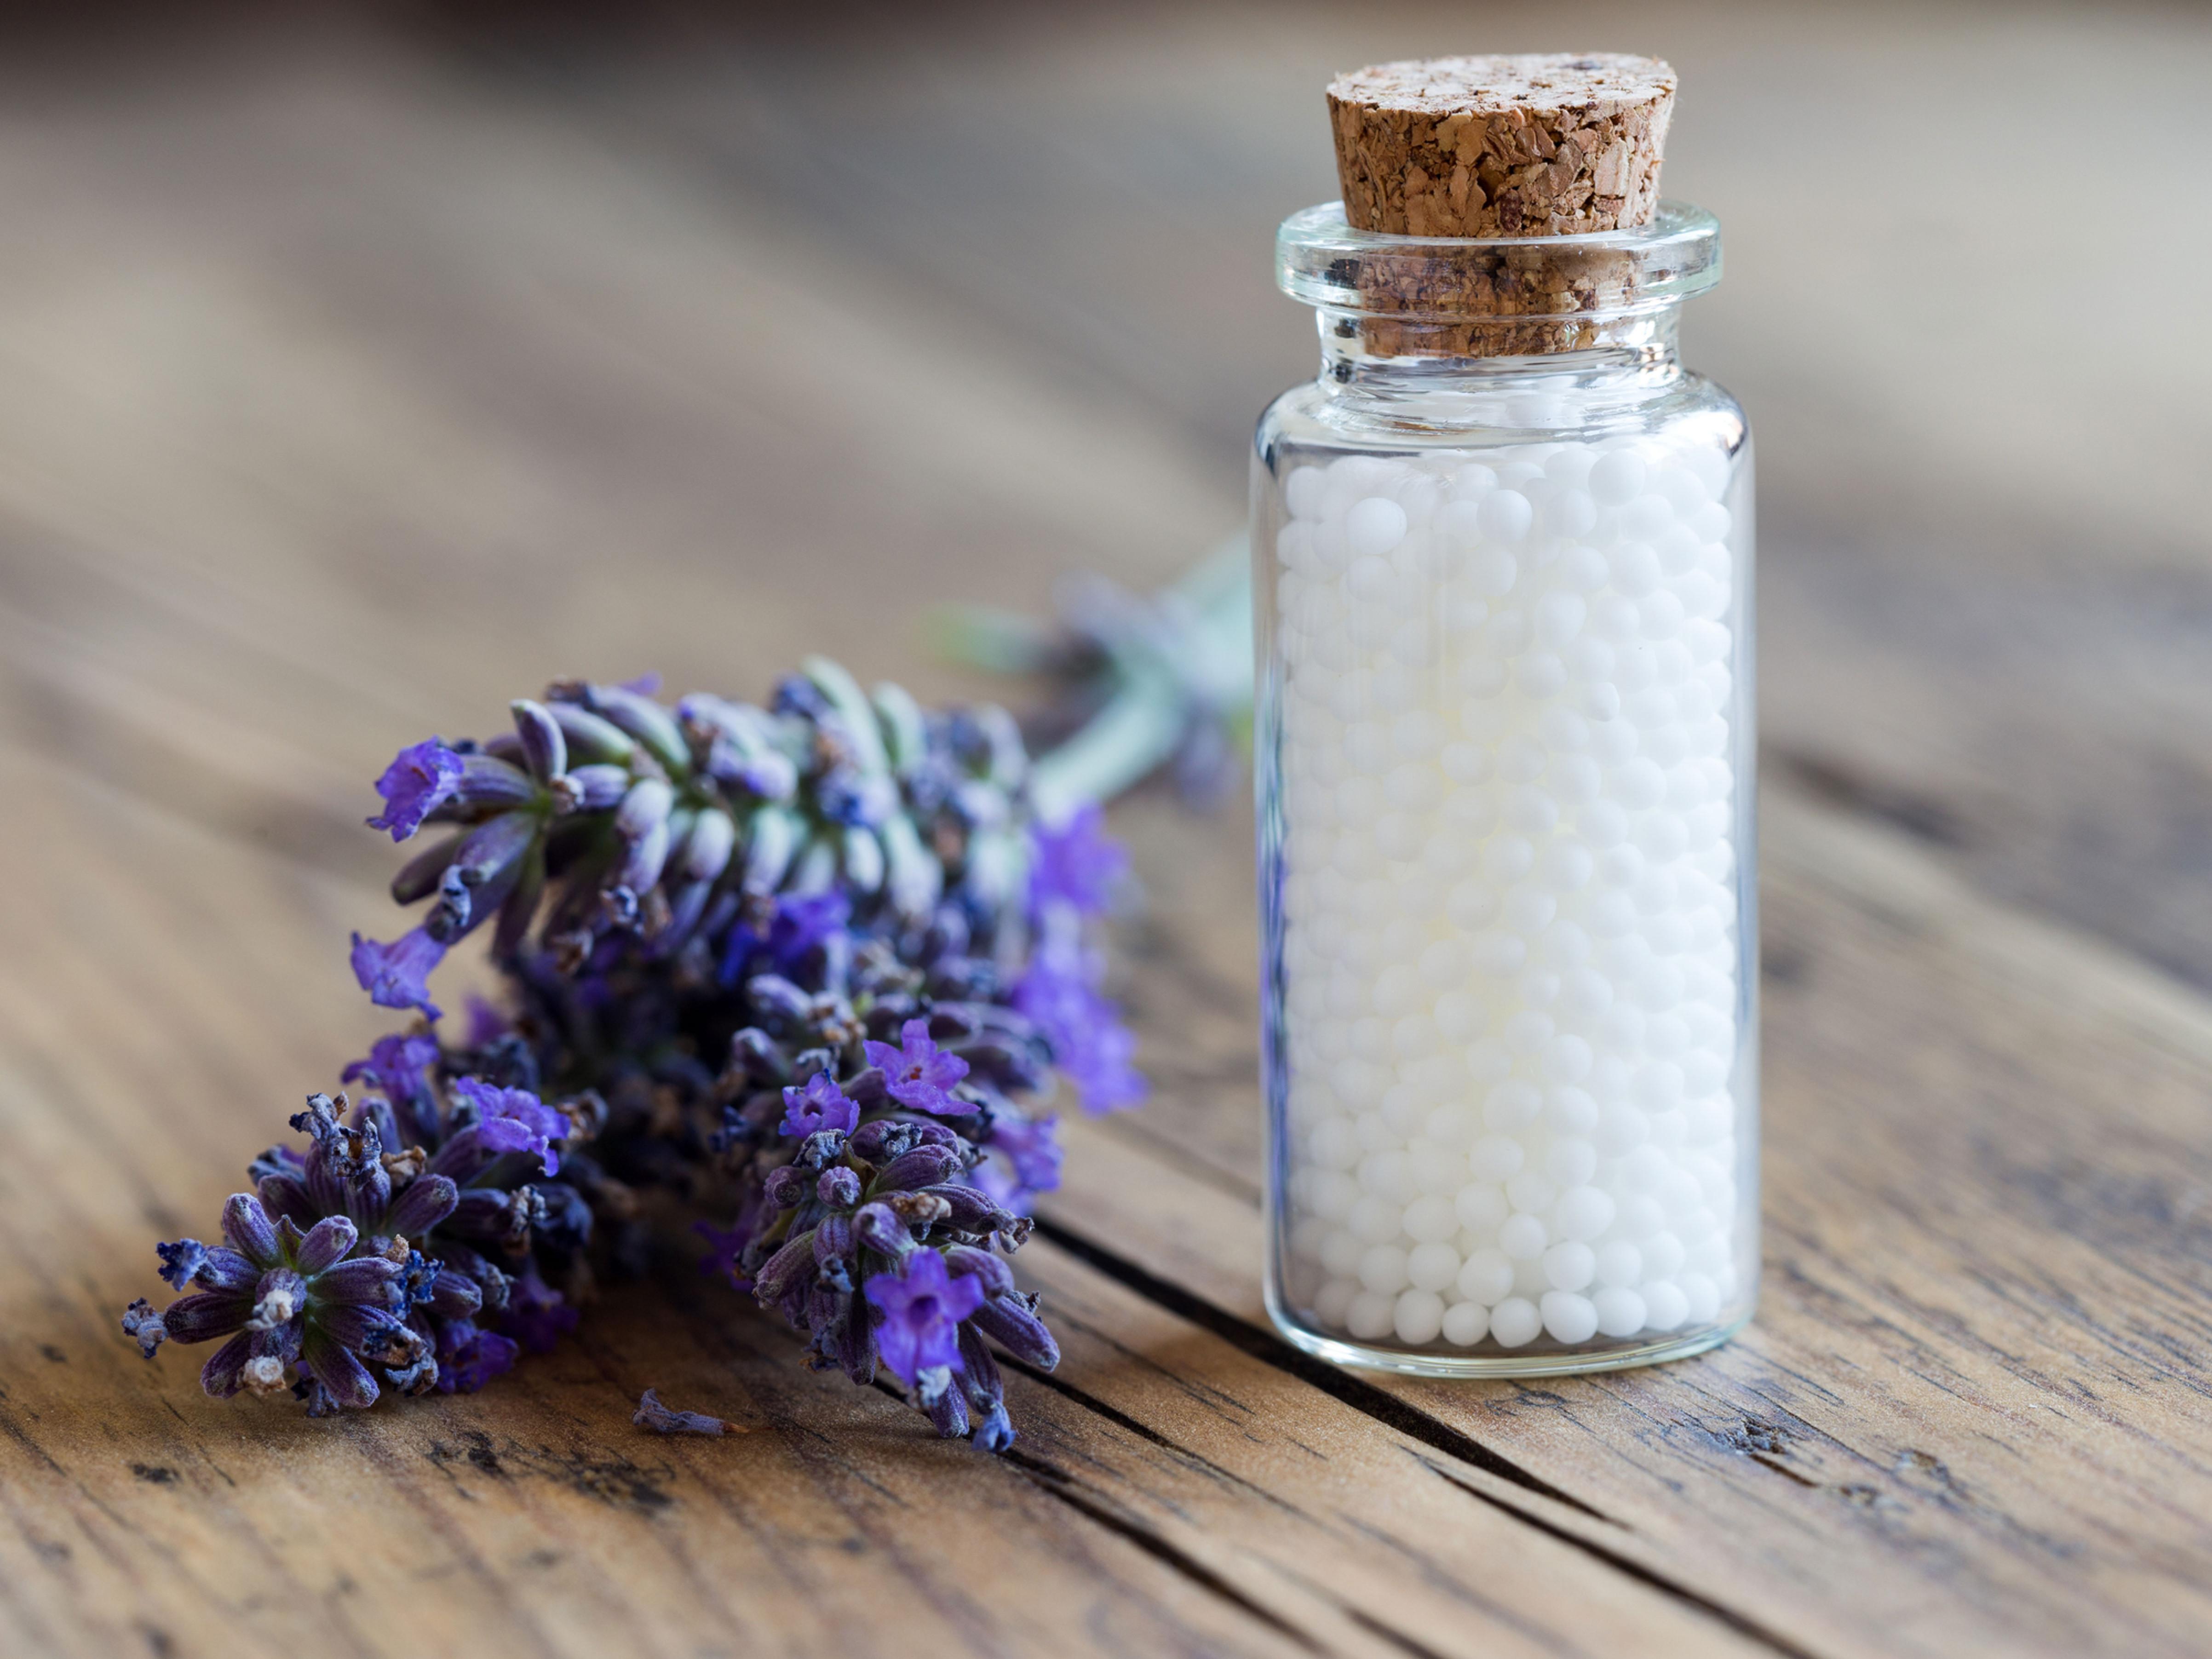 Simillimum Homeopathic Clinic Wellington